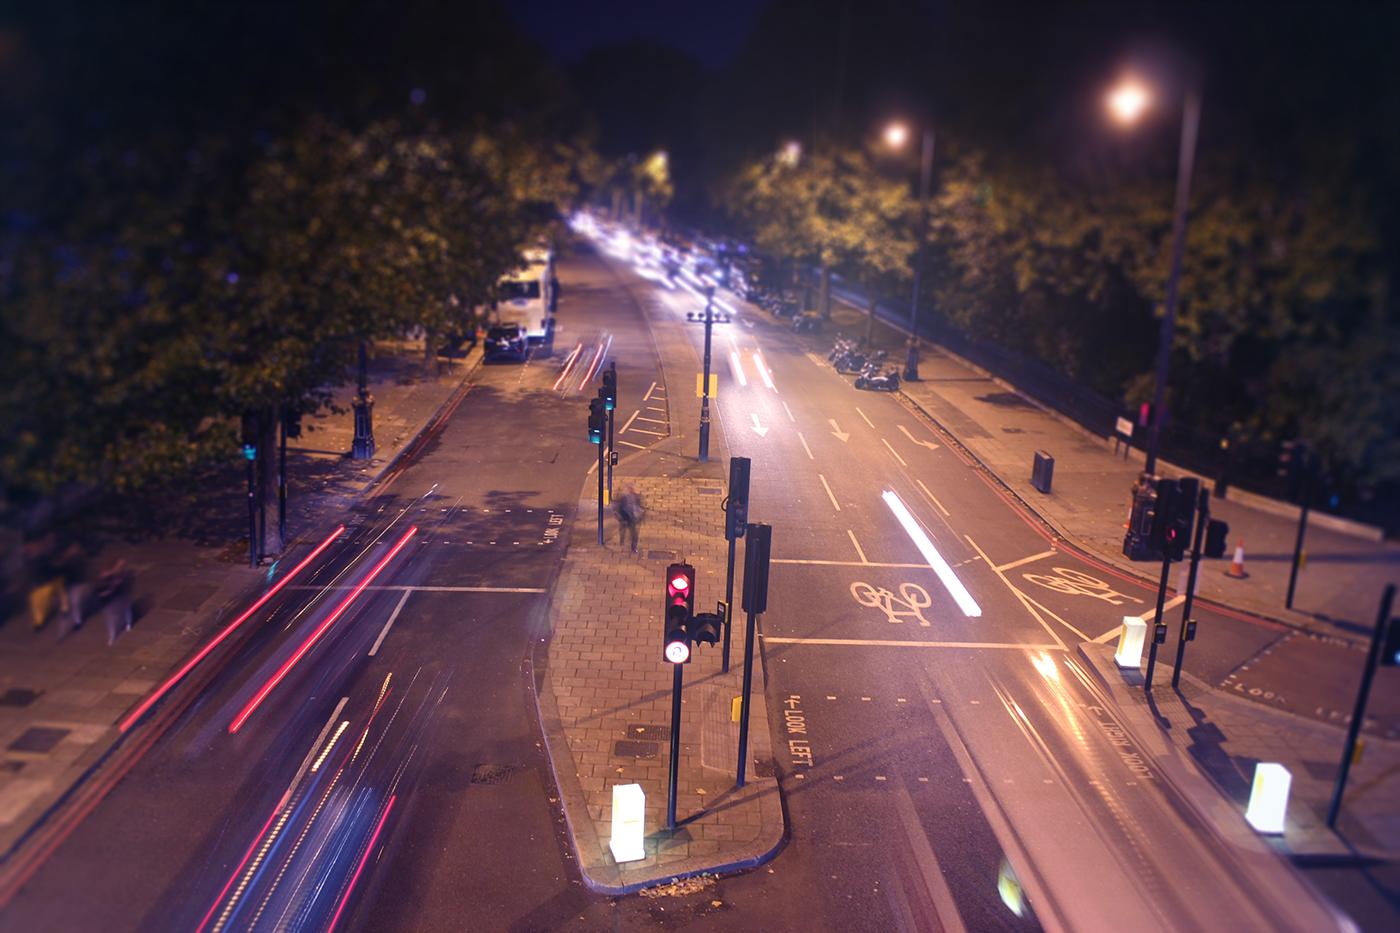 London night photo wallpaper free lights city capturing